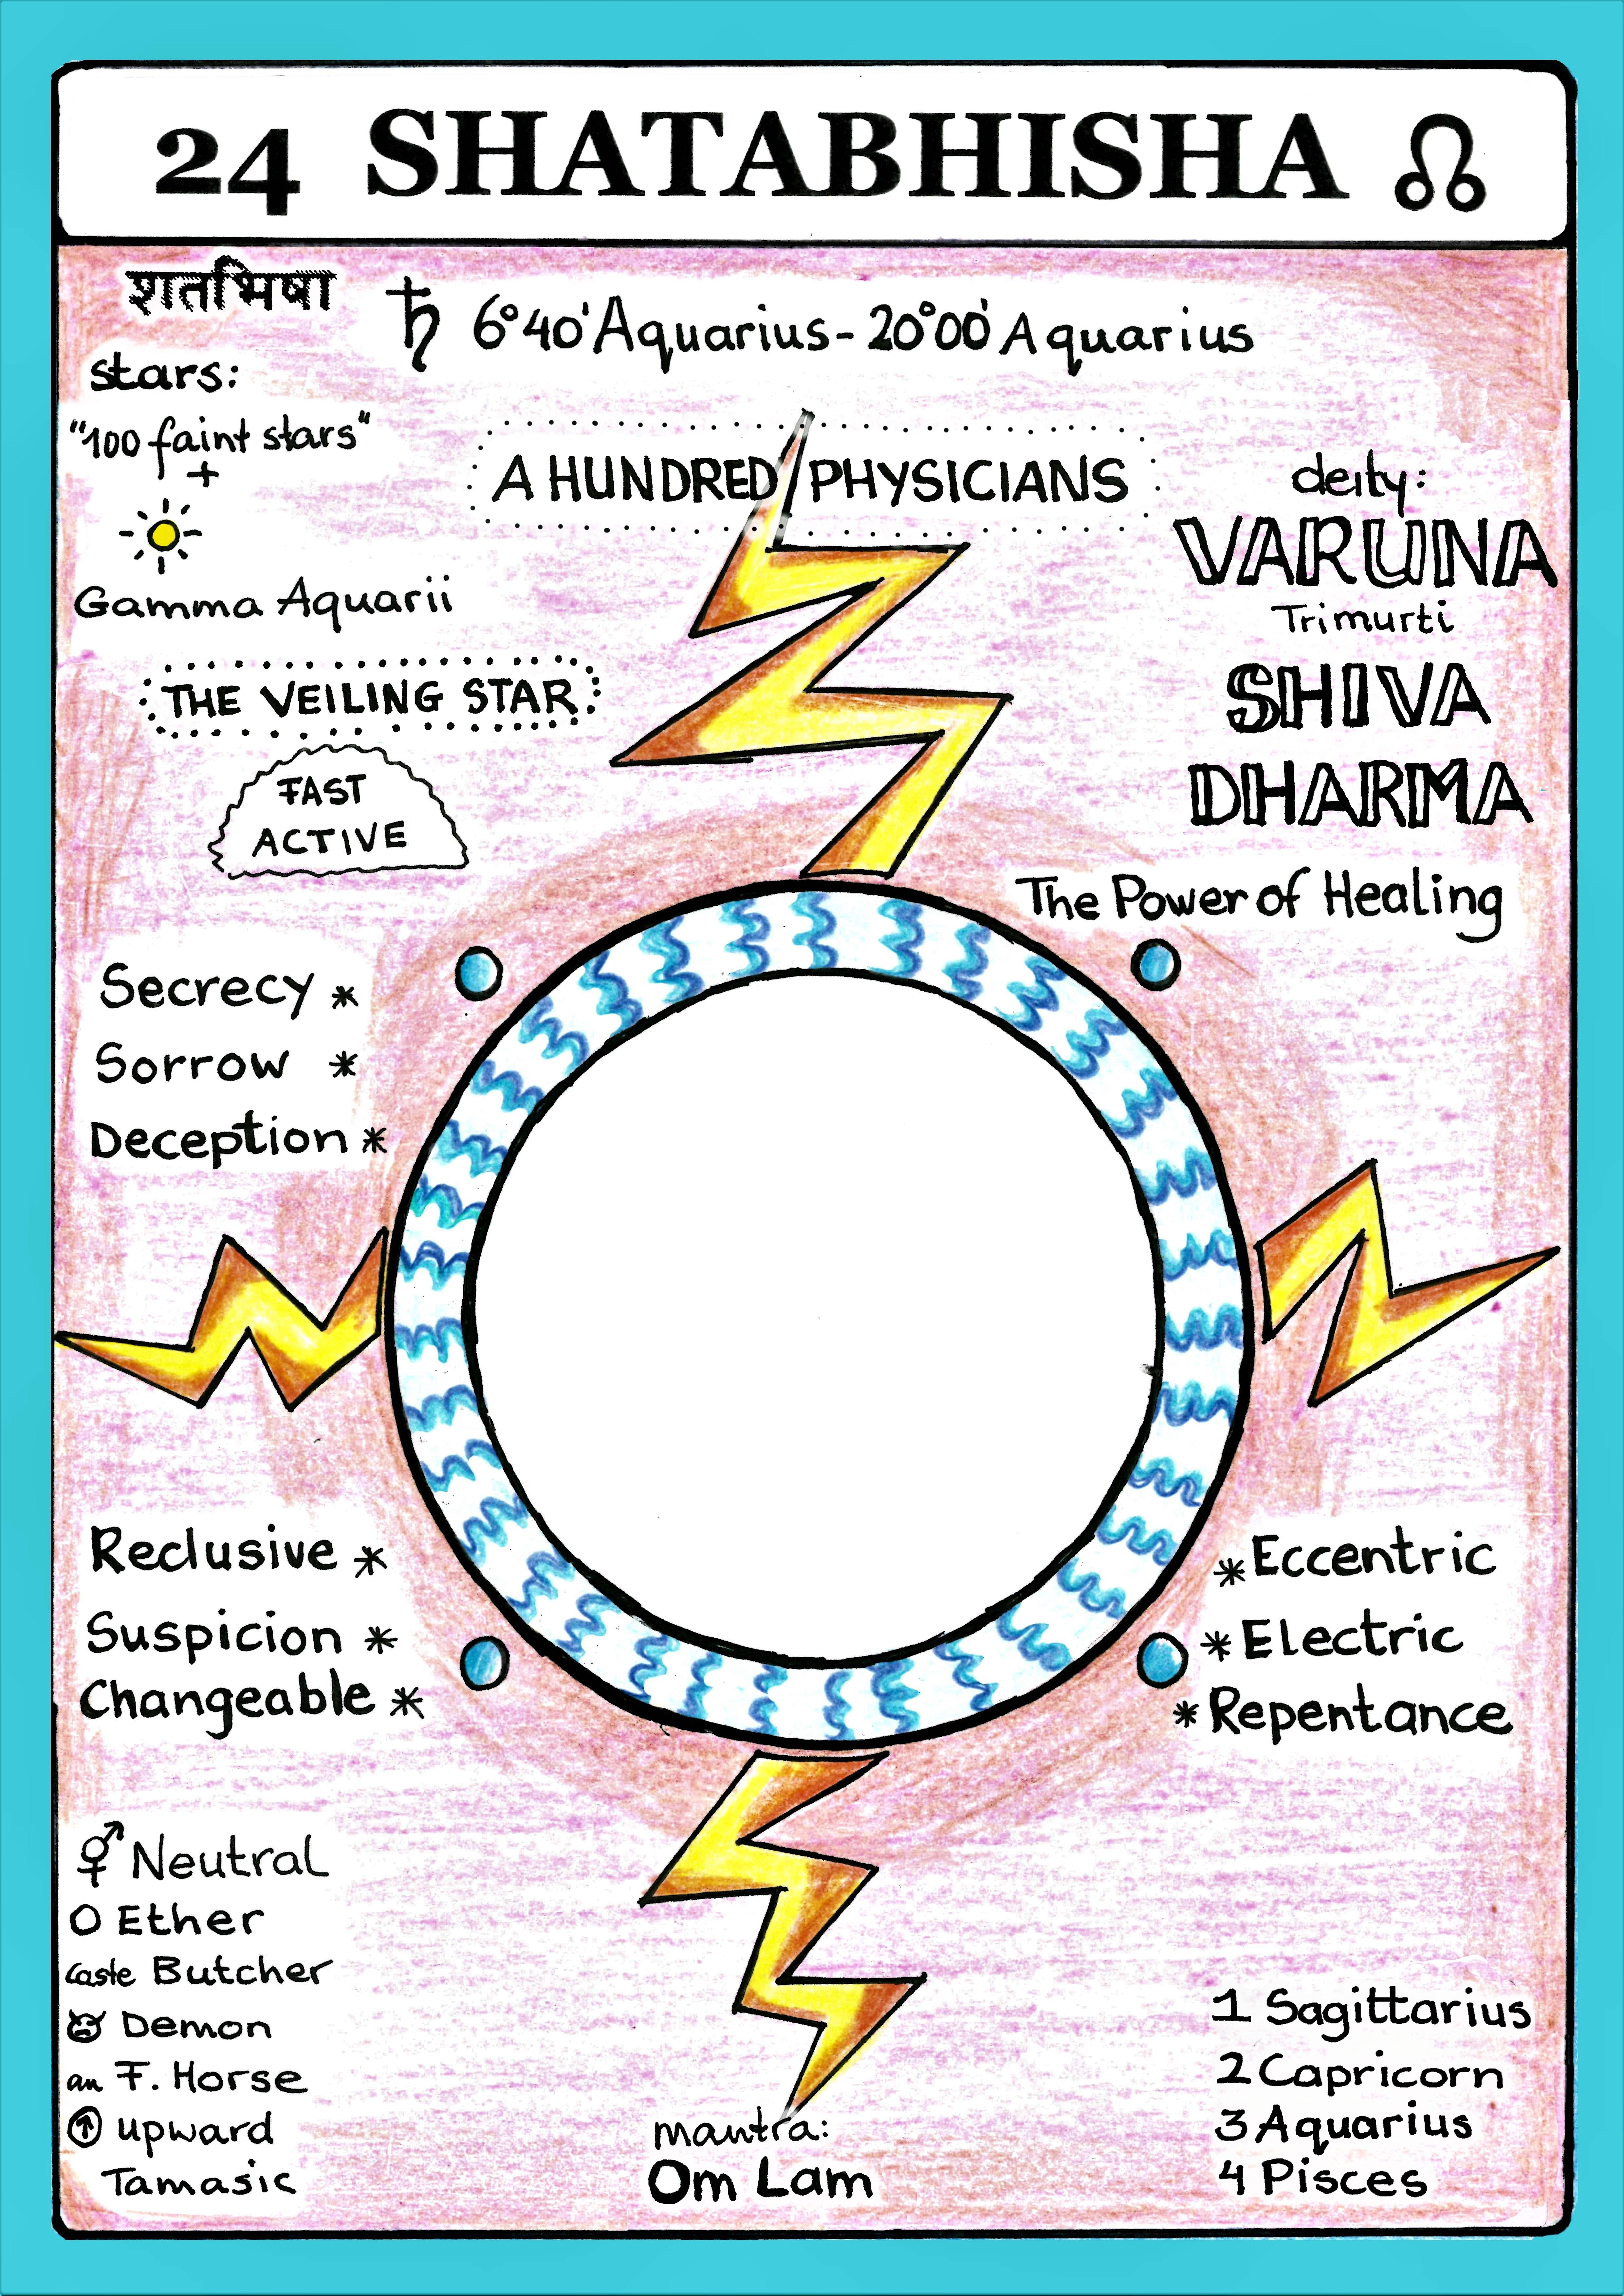 24 Shatabhisha (2)